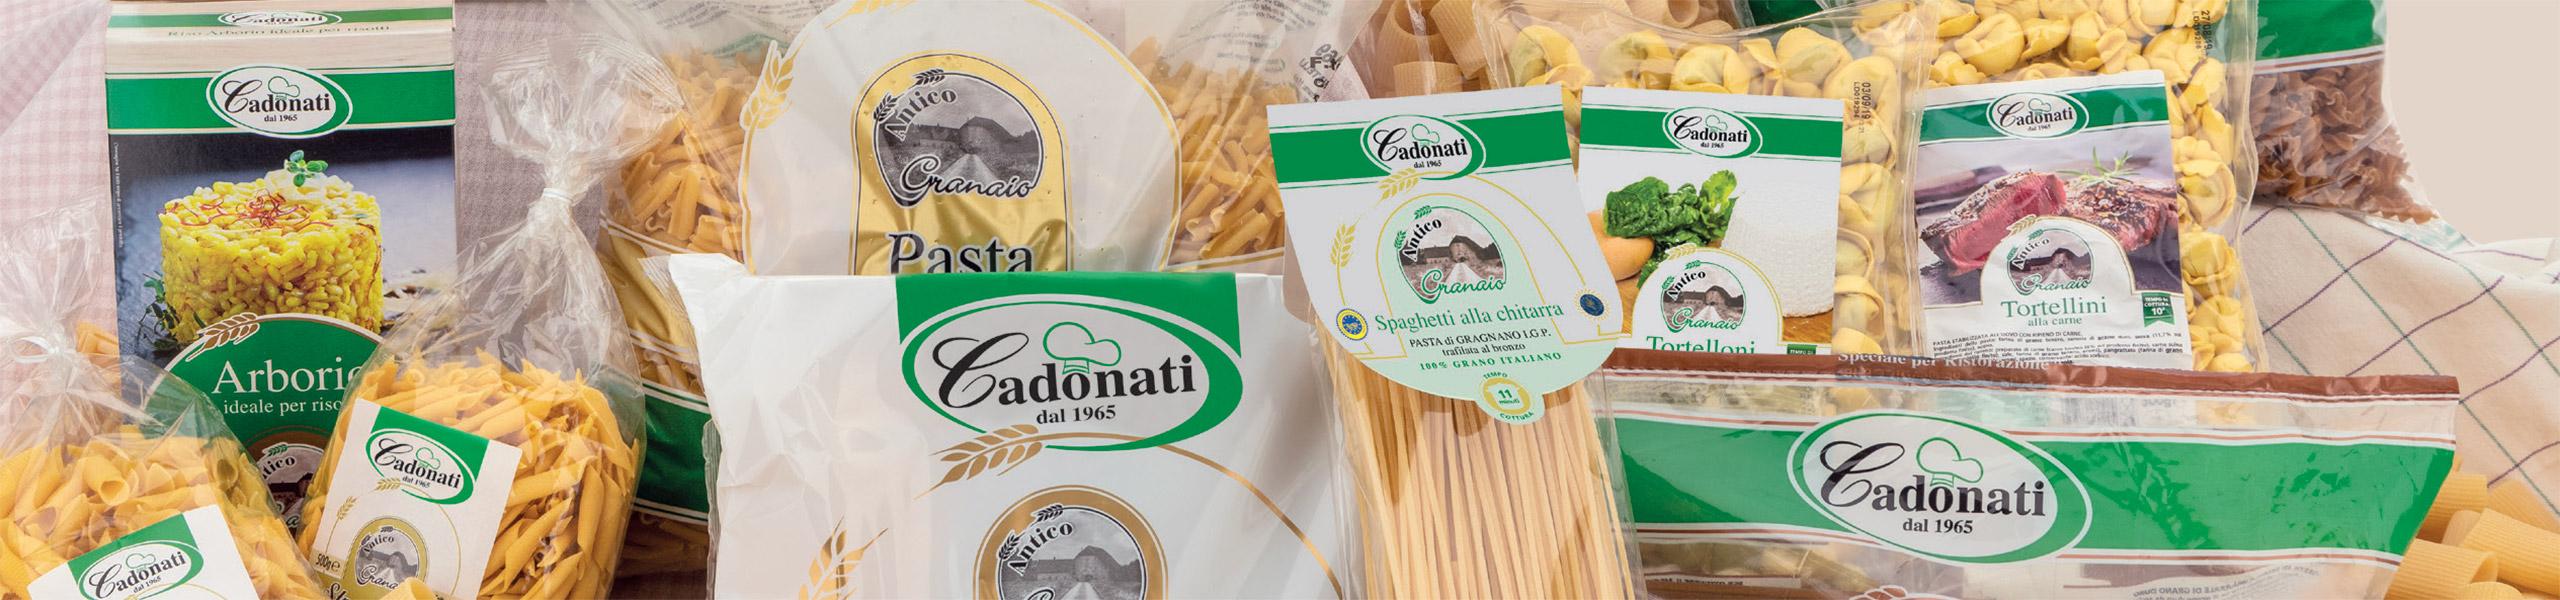 Pasta Cadonati Antico Granaio